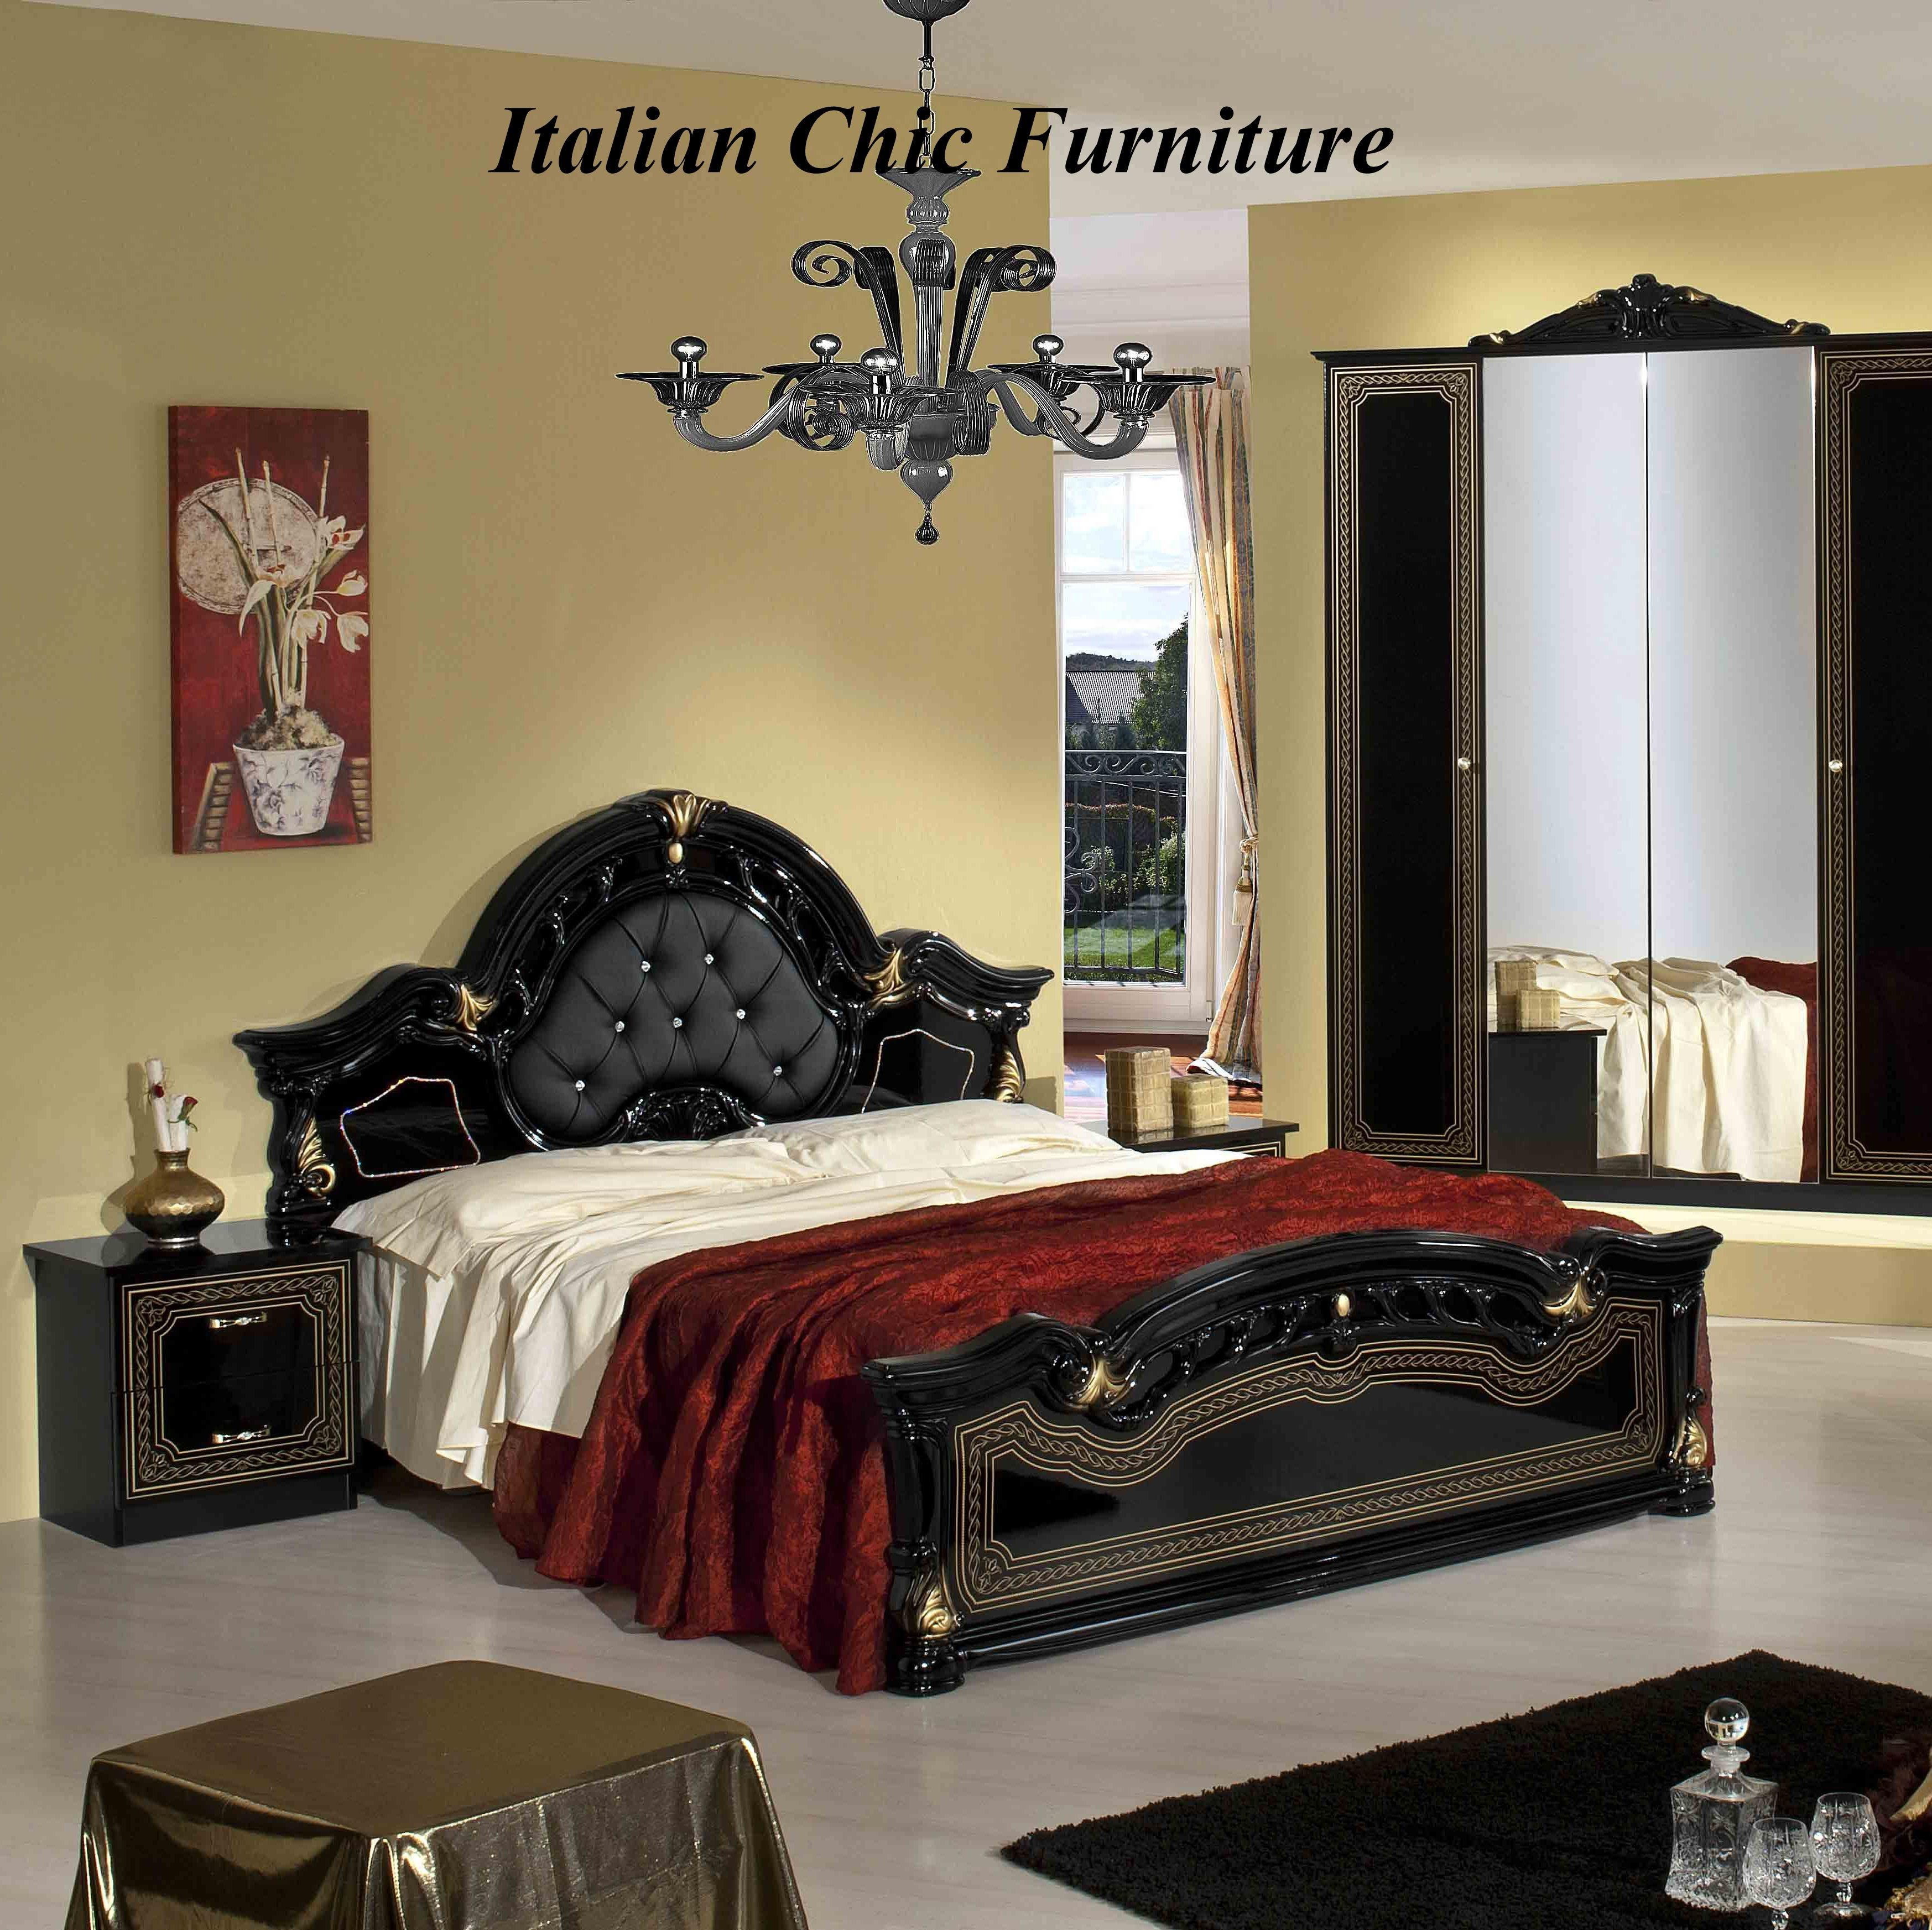 Stella Black Gold Bedroom Set With 4 Door Wardrobe From Italian